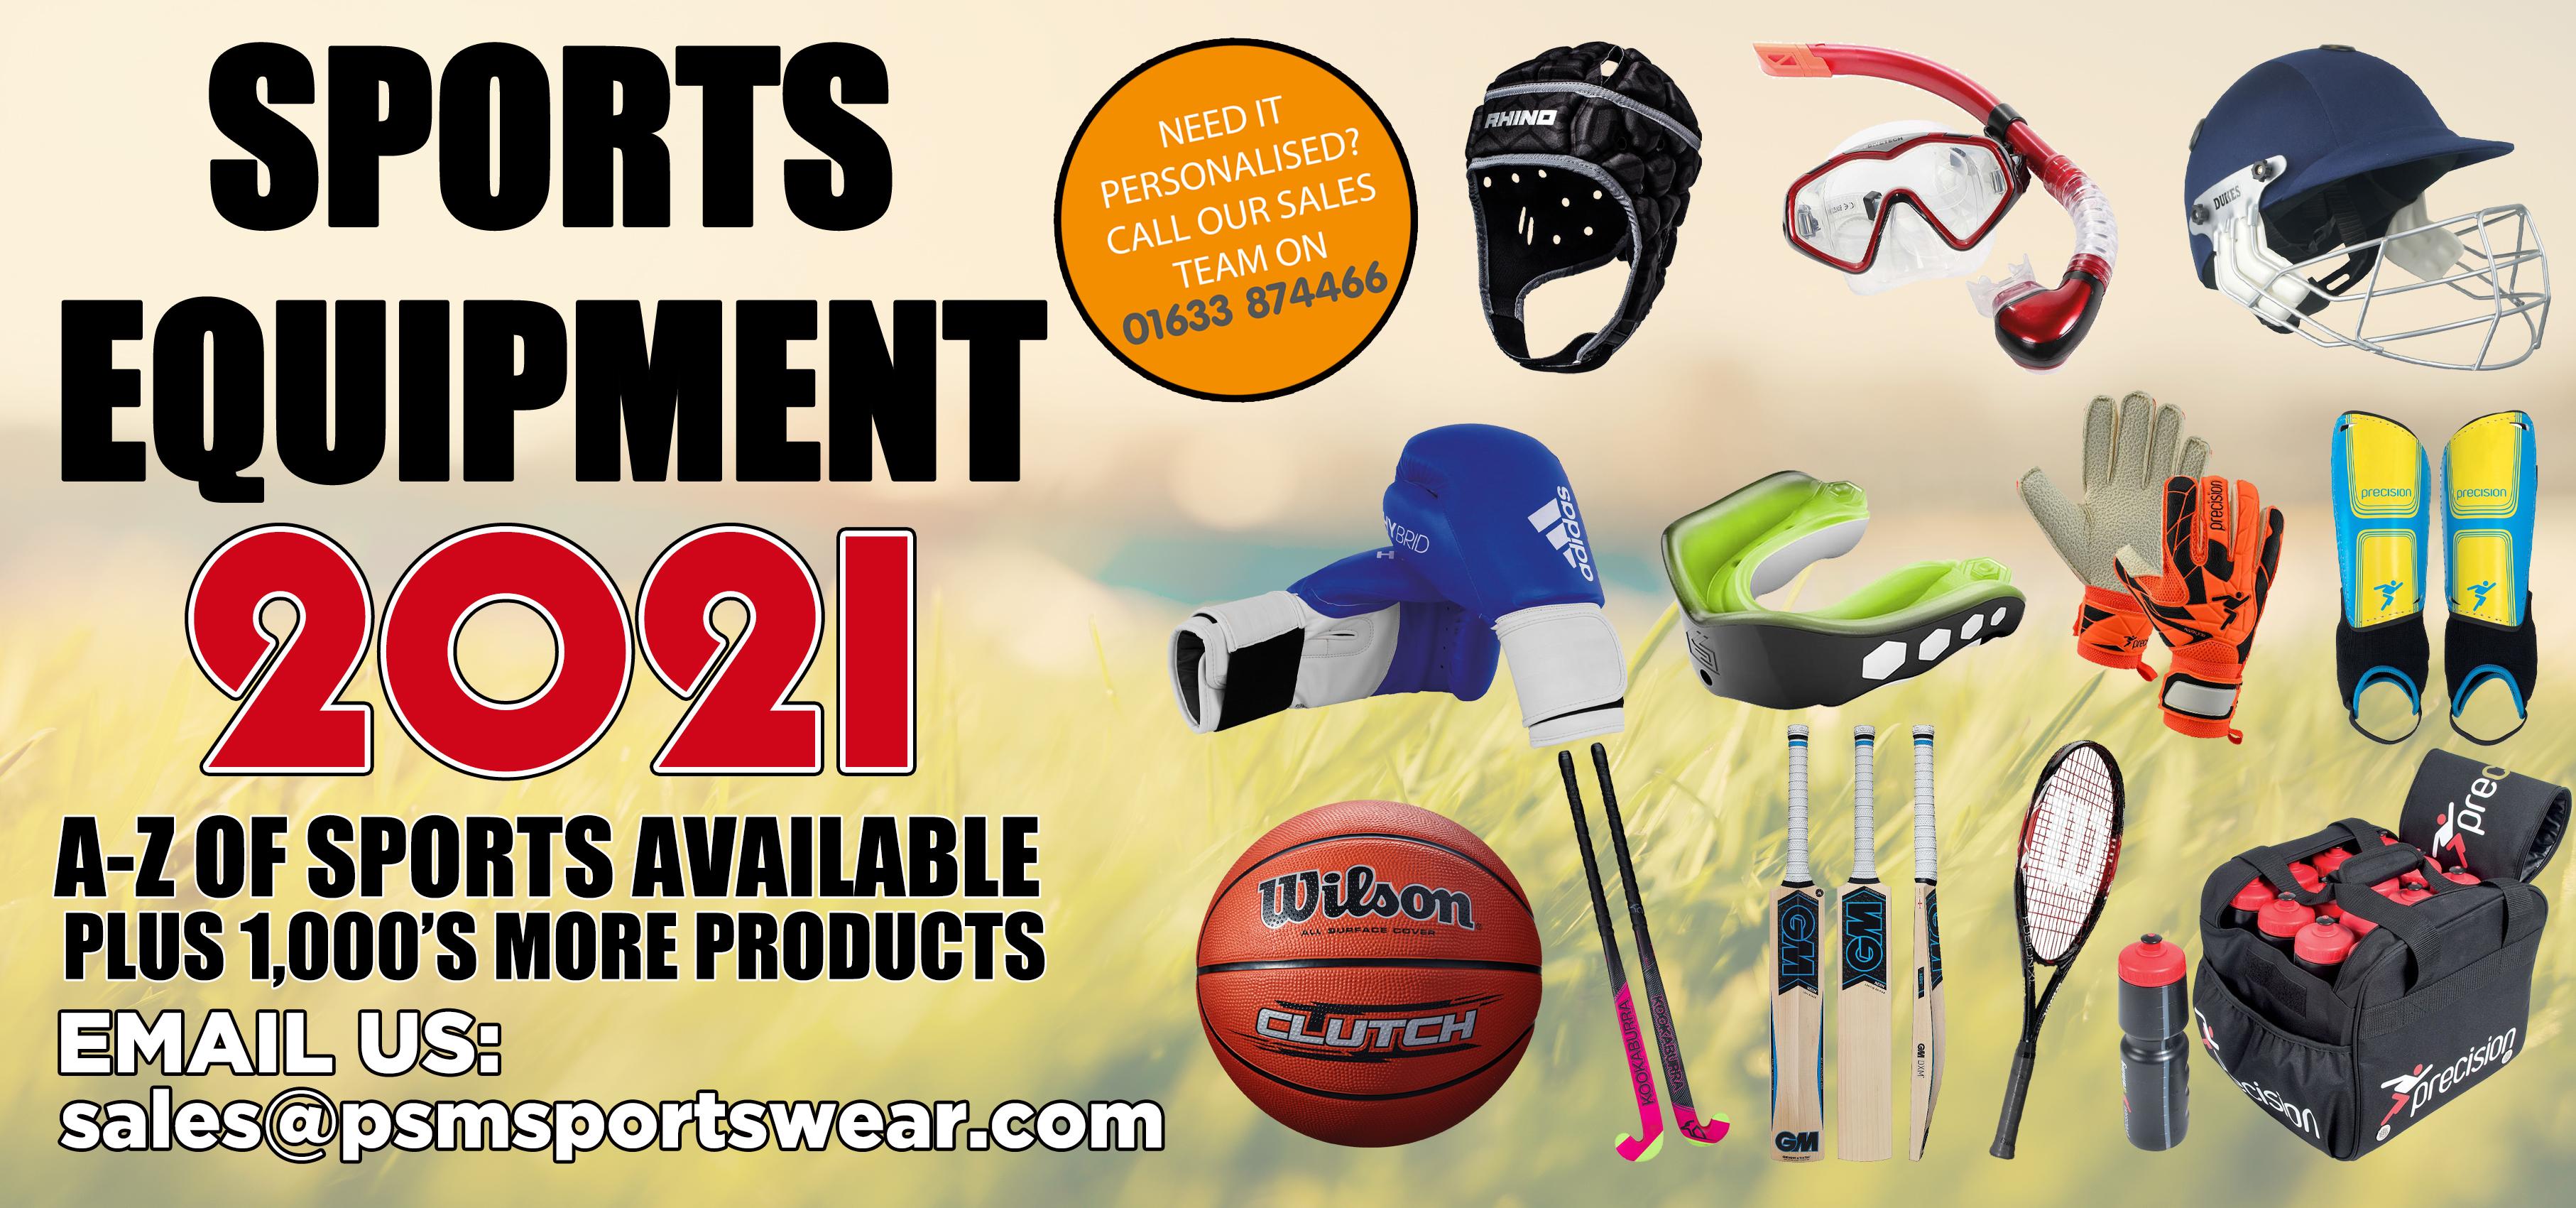 sports_equipment_2021